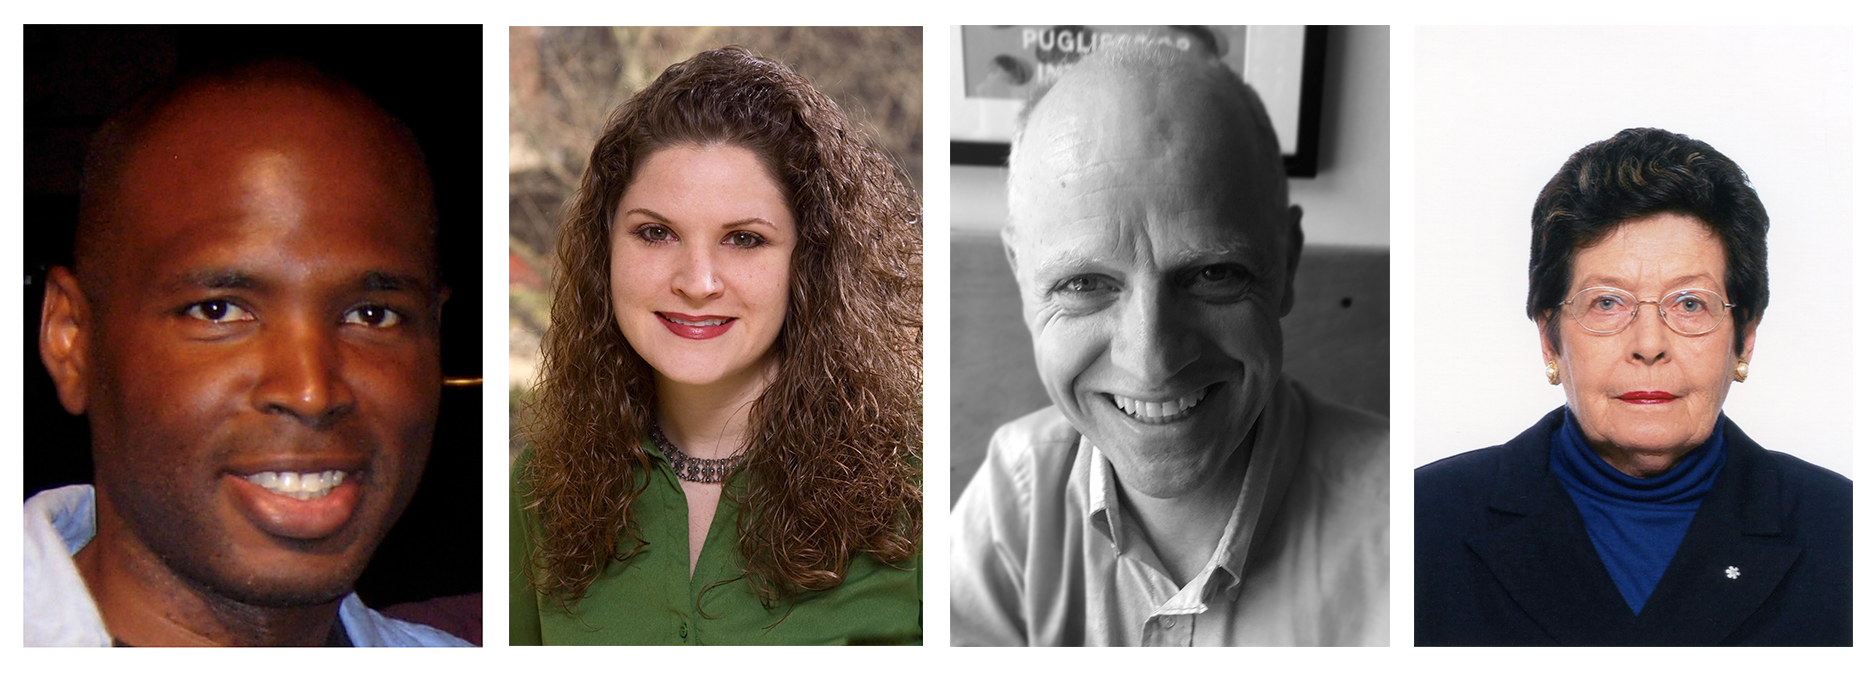 L-R: panellist Patrick Lynn Rivers; panel moderator Monica Patterson; panellist Charles Reeve; panellist Jennifer Dickson.